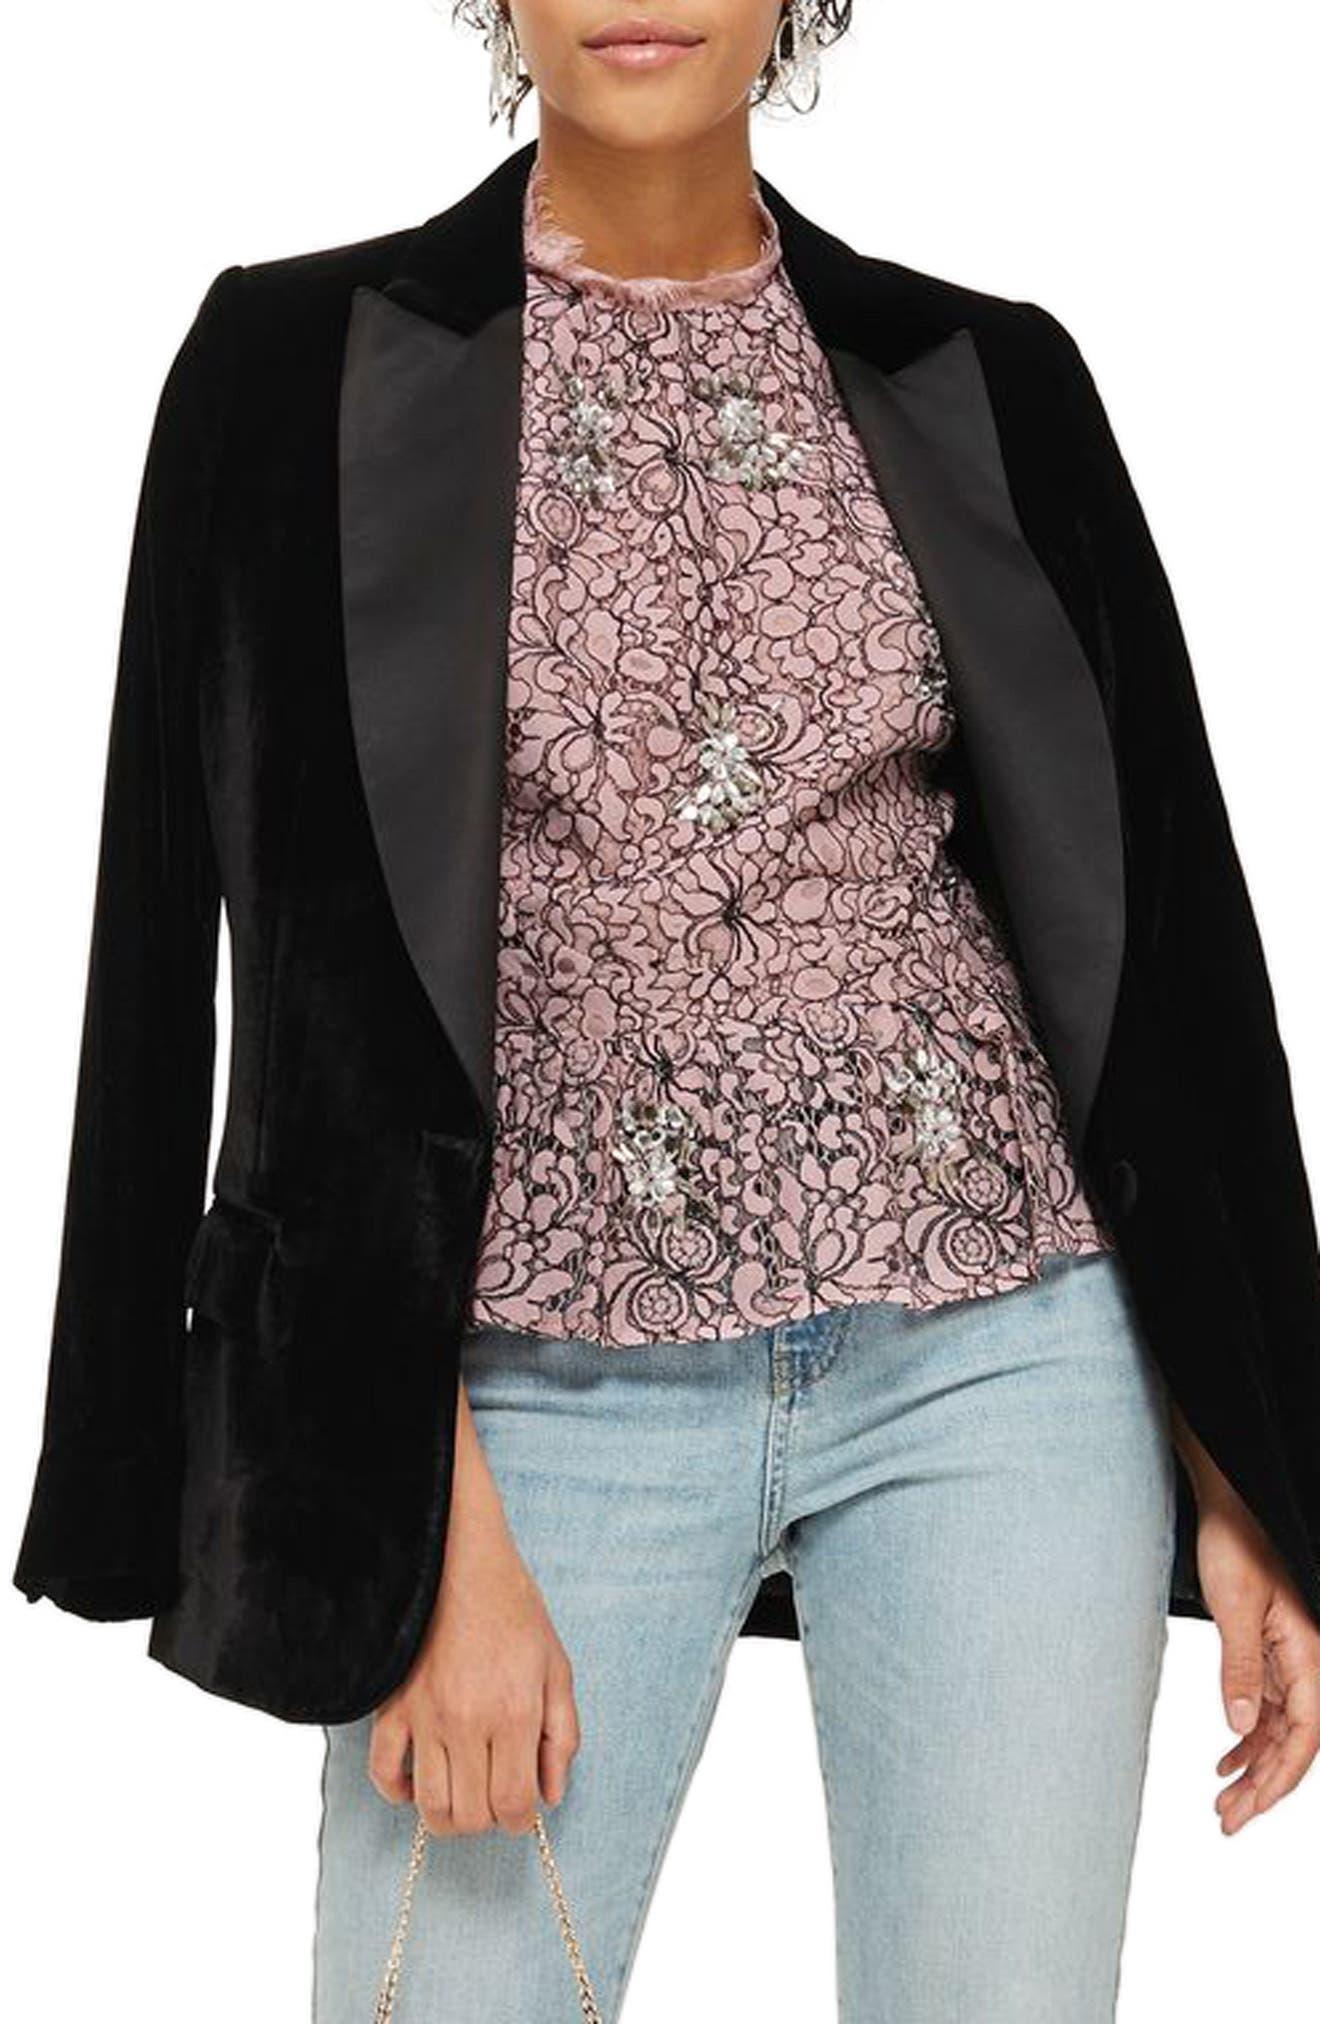 Topshop Embellished High Neck Lace Top